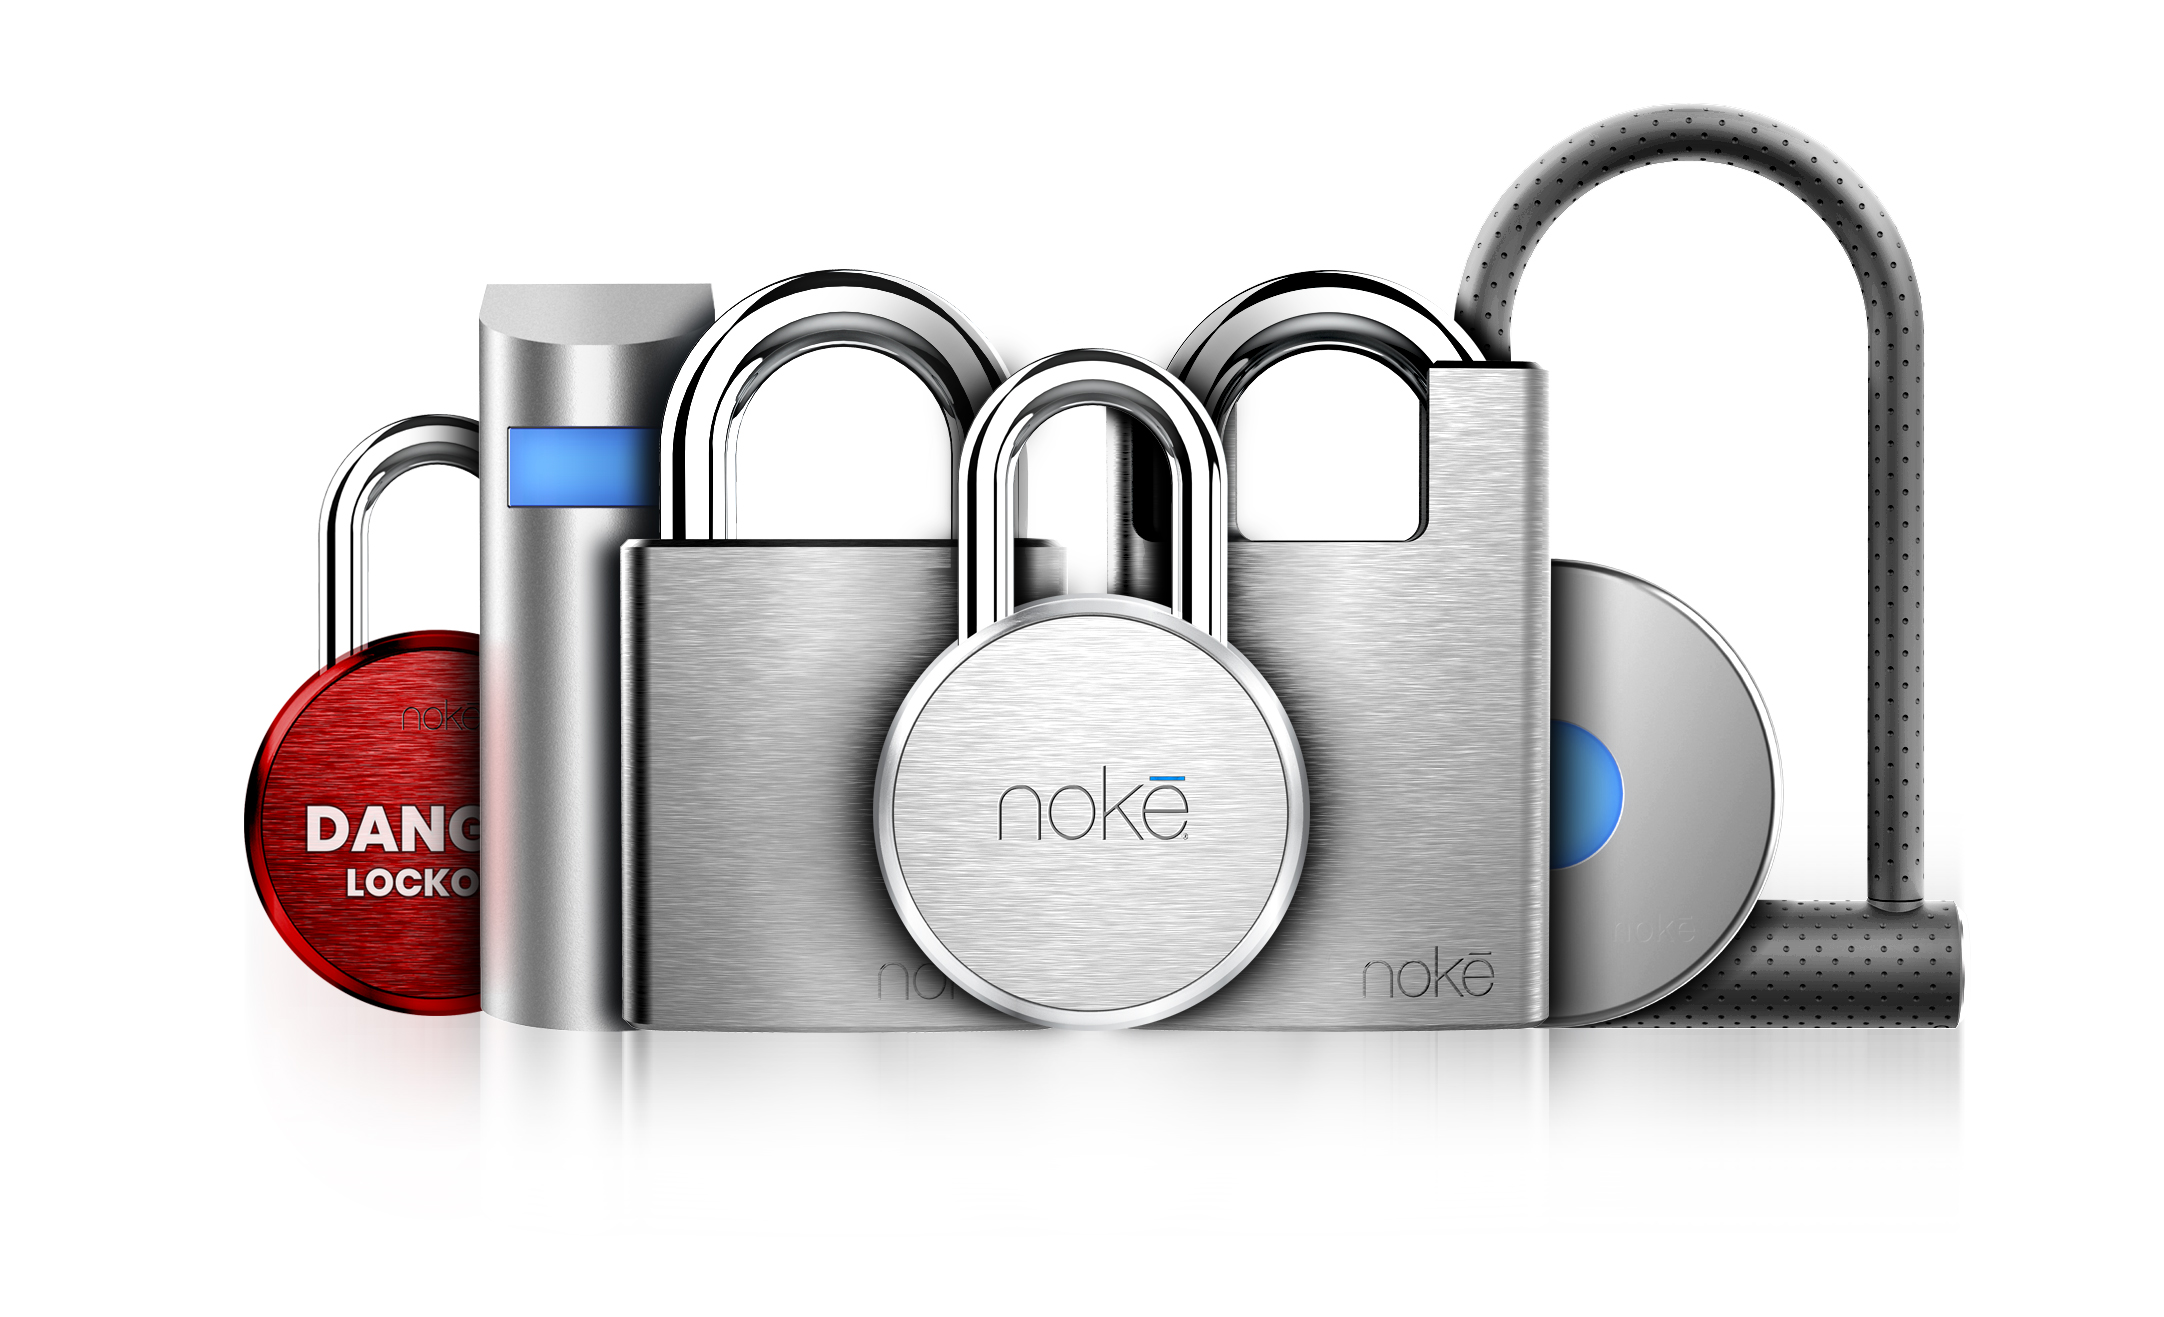 Nokē | Bluetooth padlock, door lock, U-Lock | Keyless Lock Management for your Business